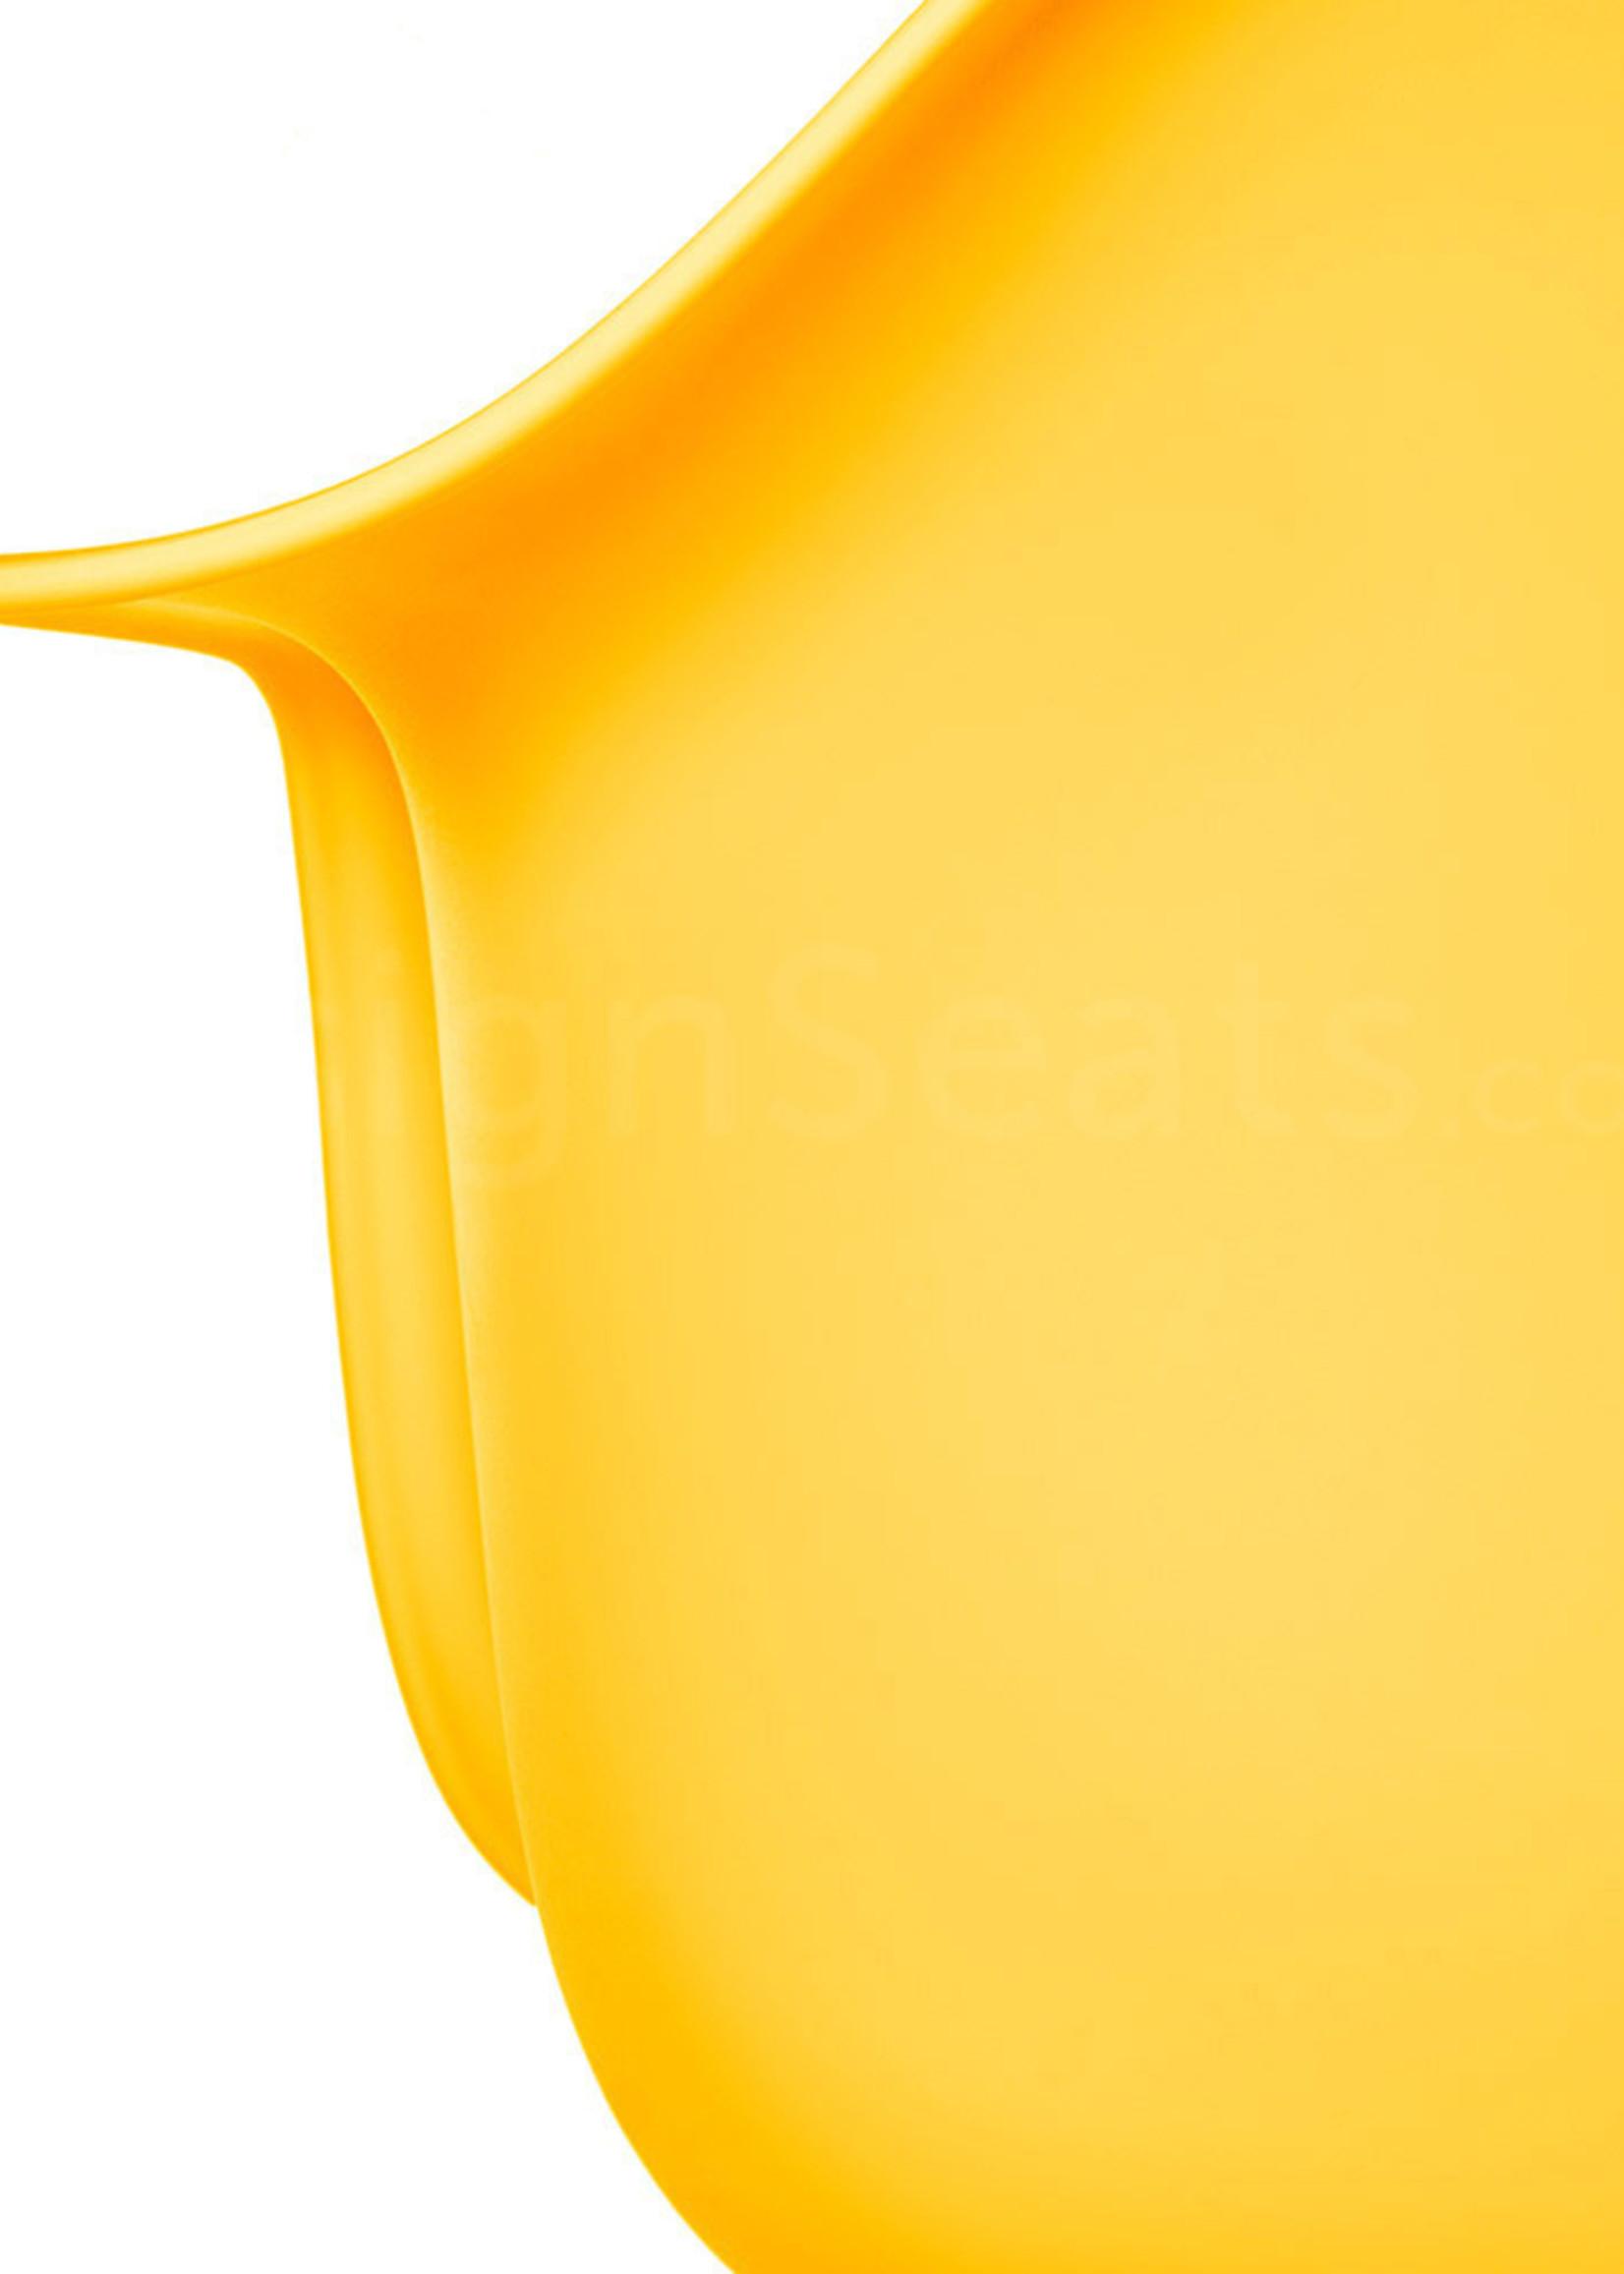 DAR Eames Design Kinderstoel Maisgeel